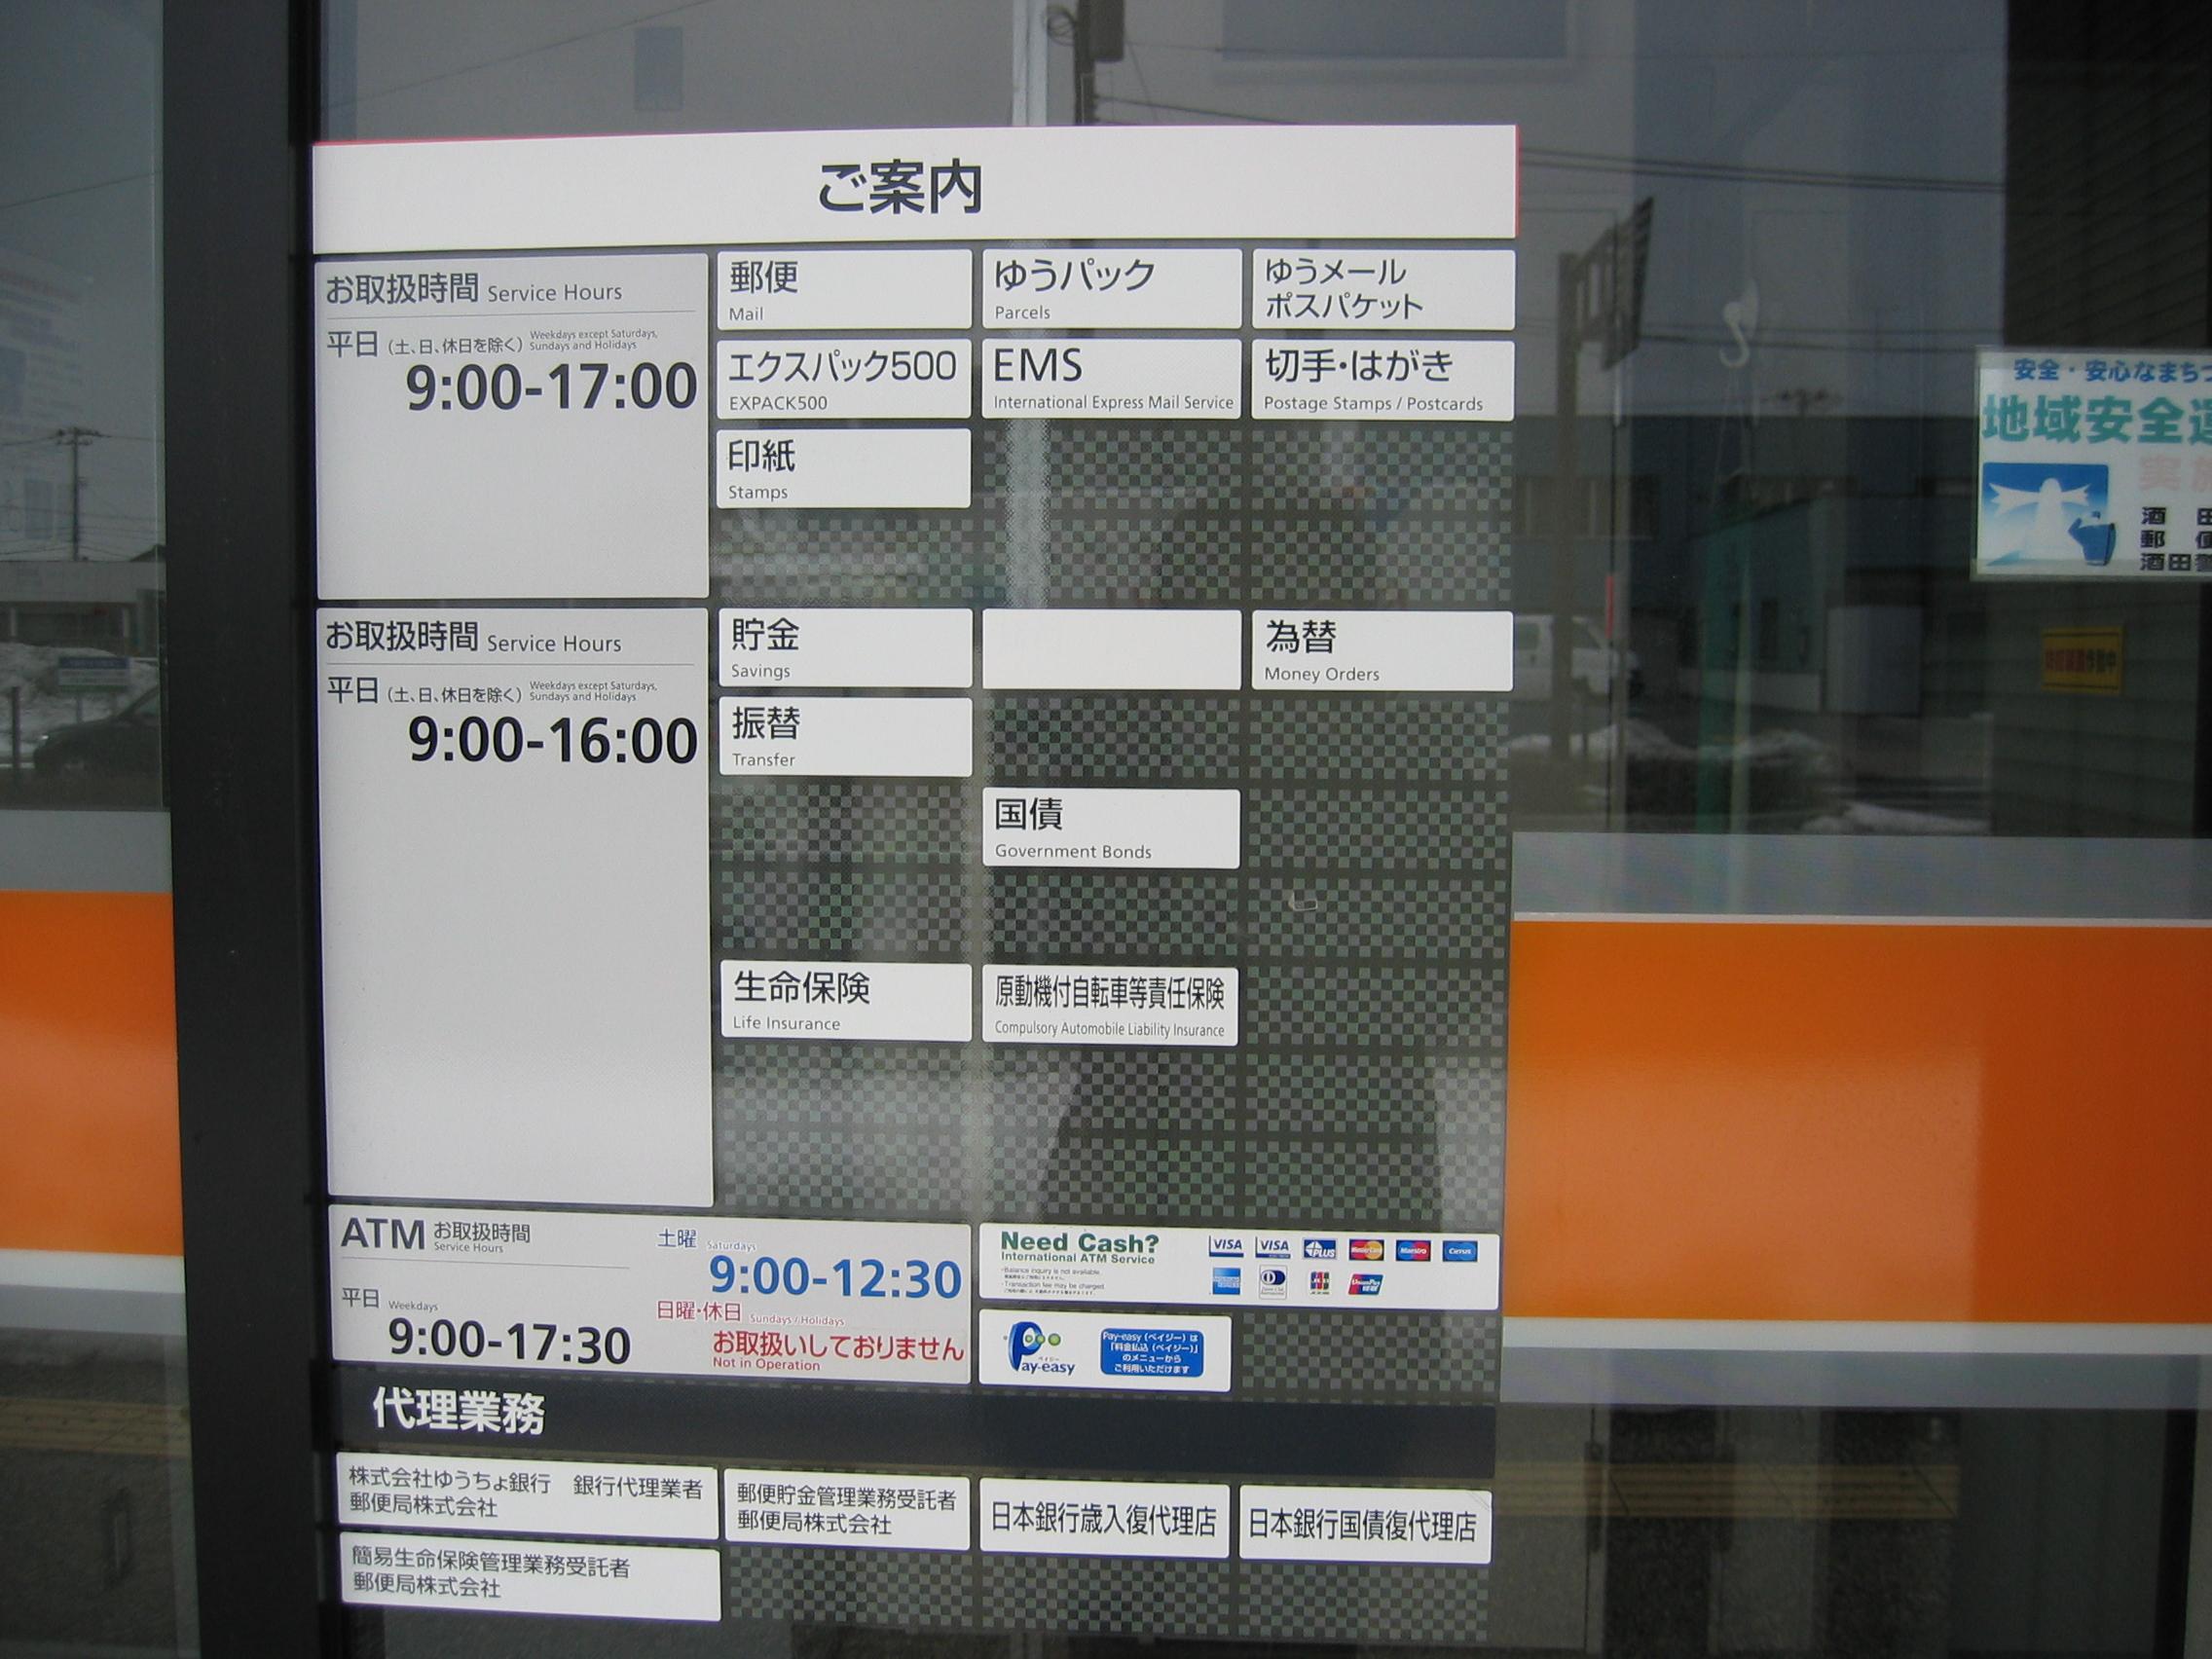 FileJP NETWORK Sakata Sankyomachi Post fice guidance signboard